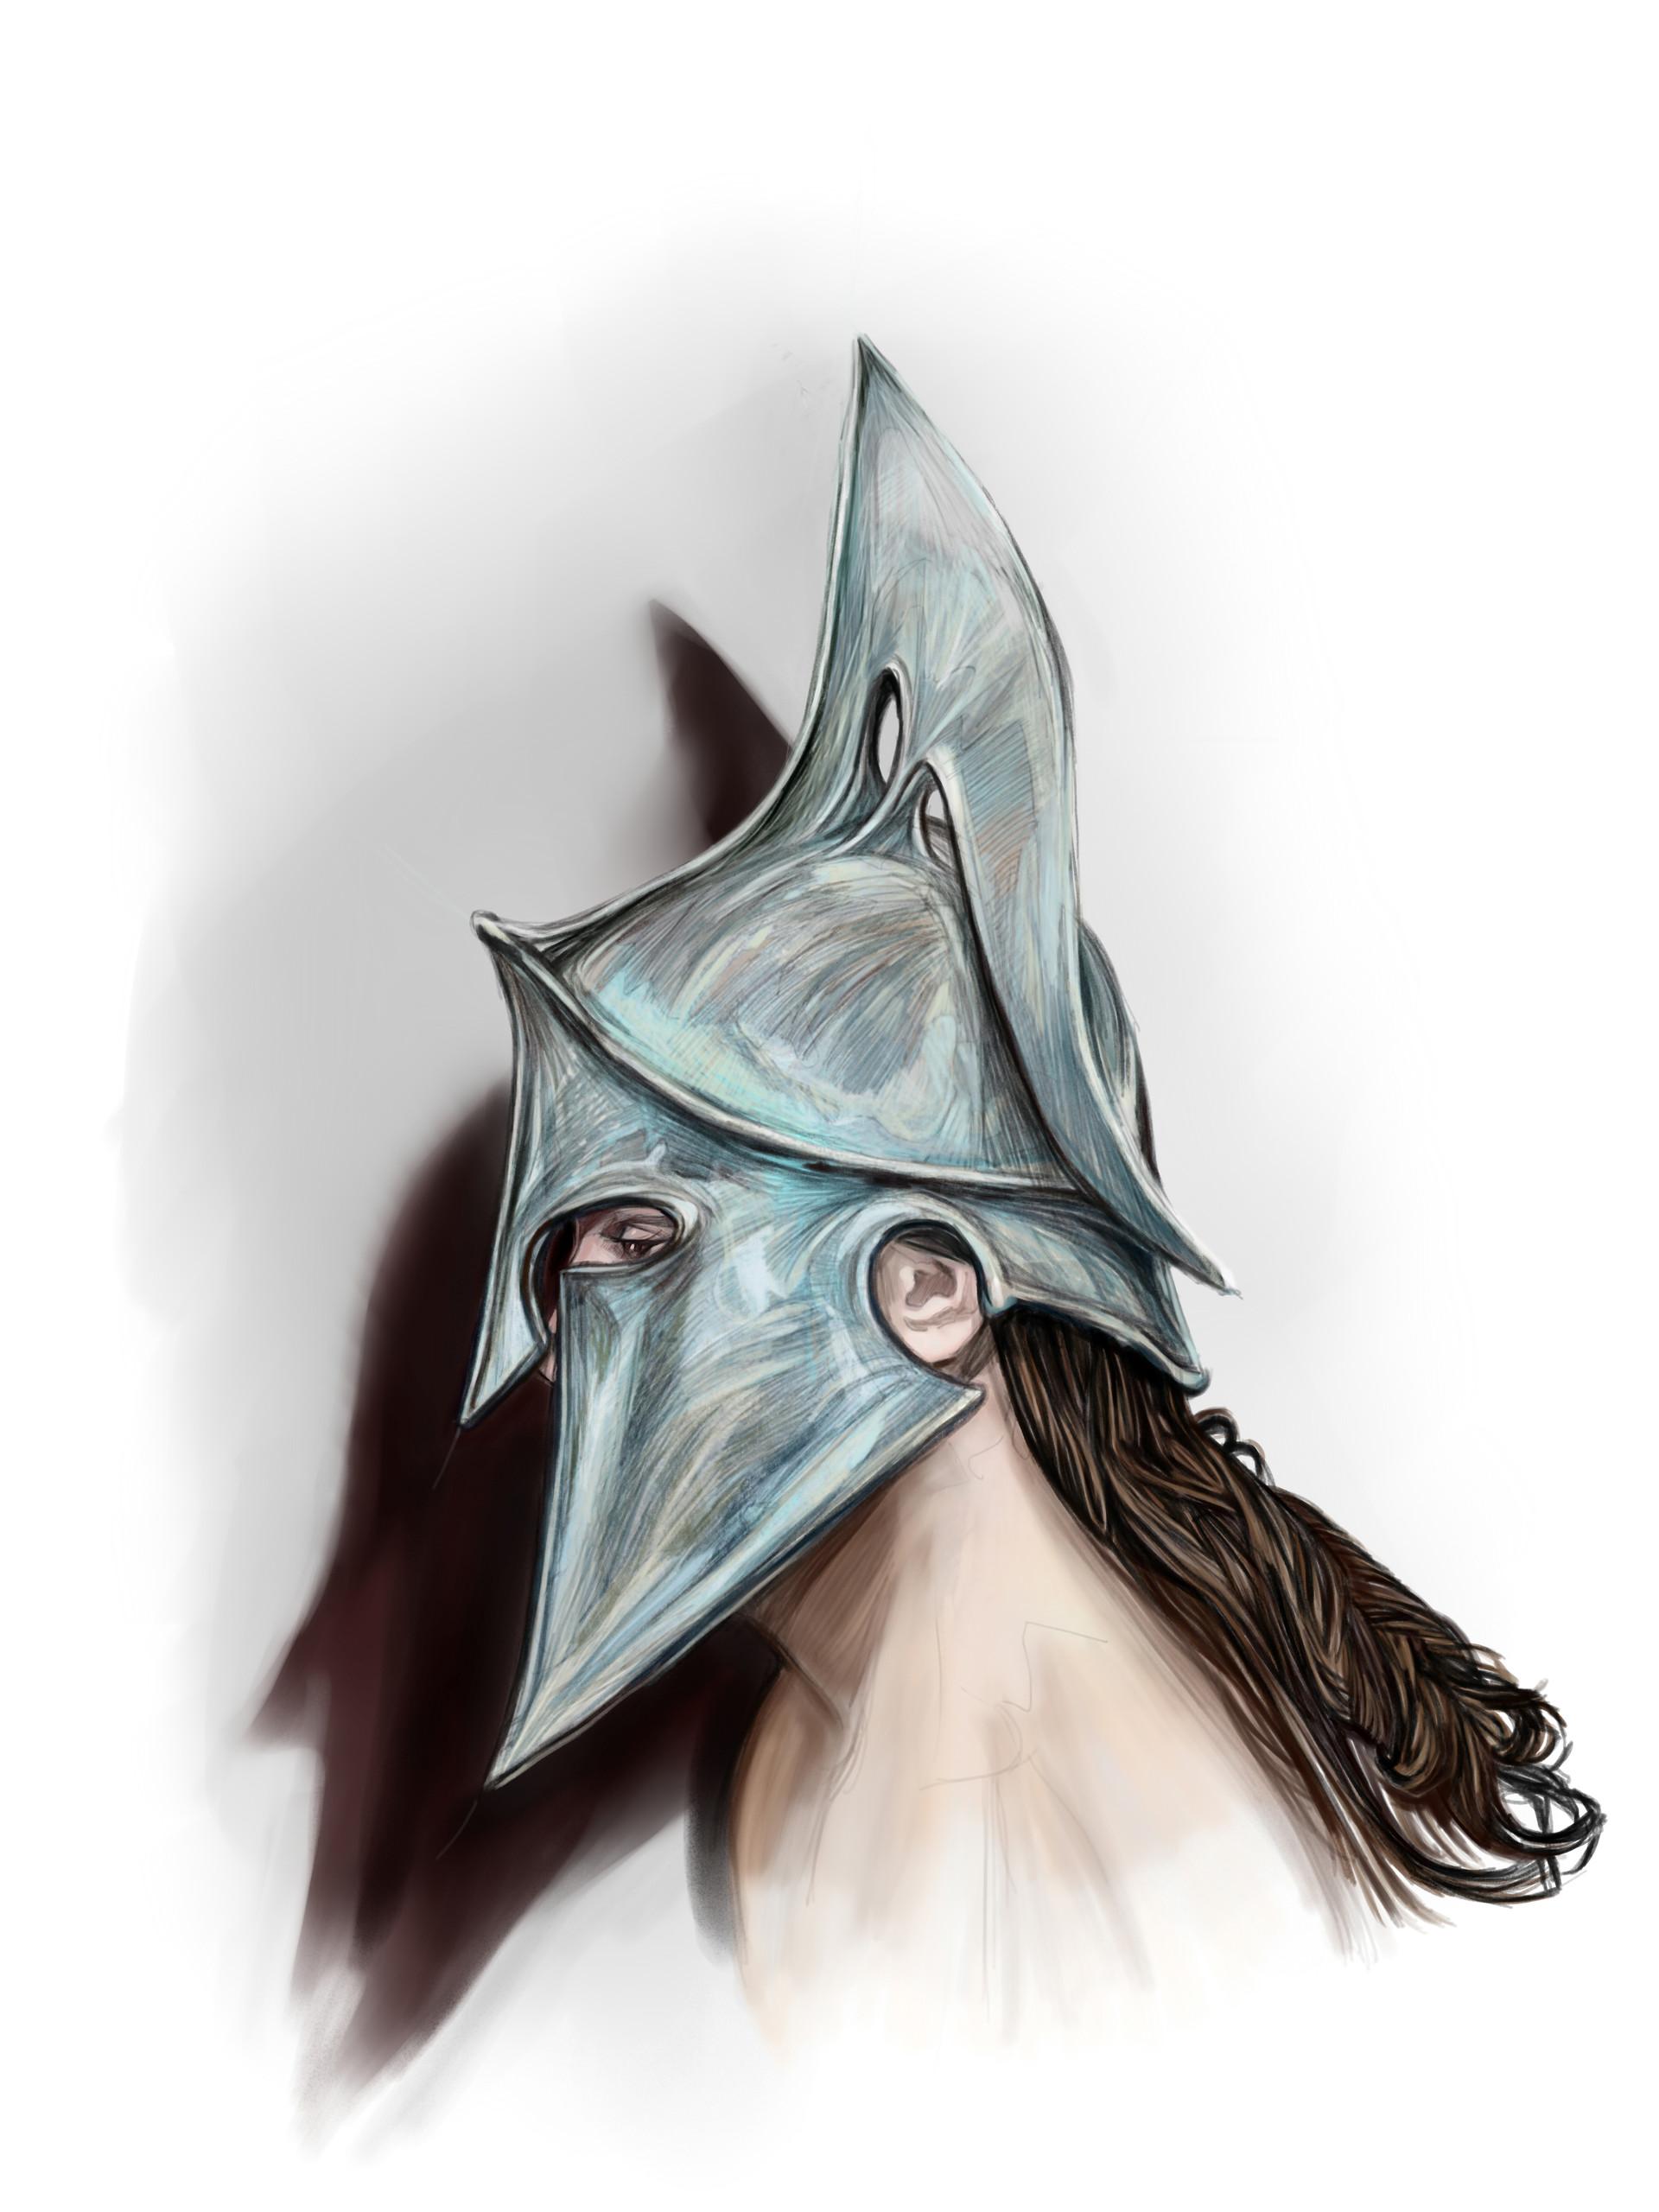 Ea howell side helmet